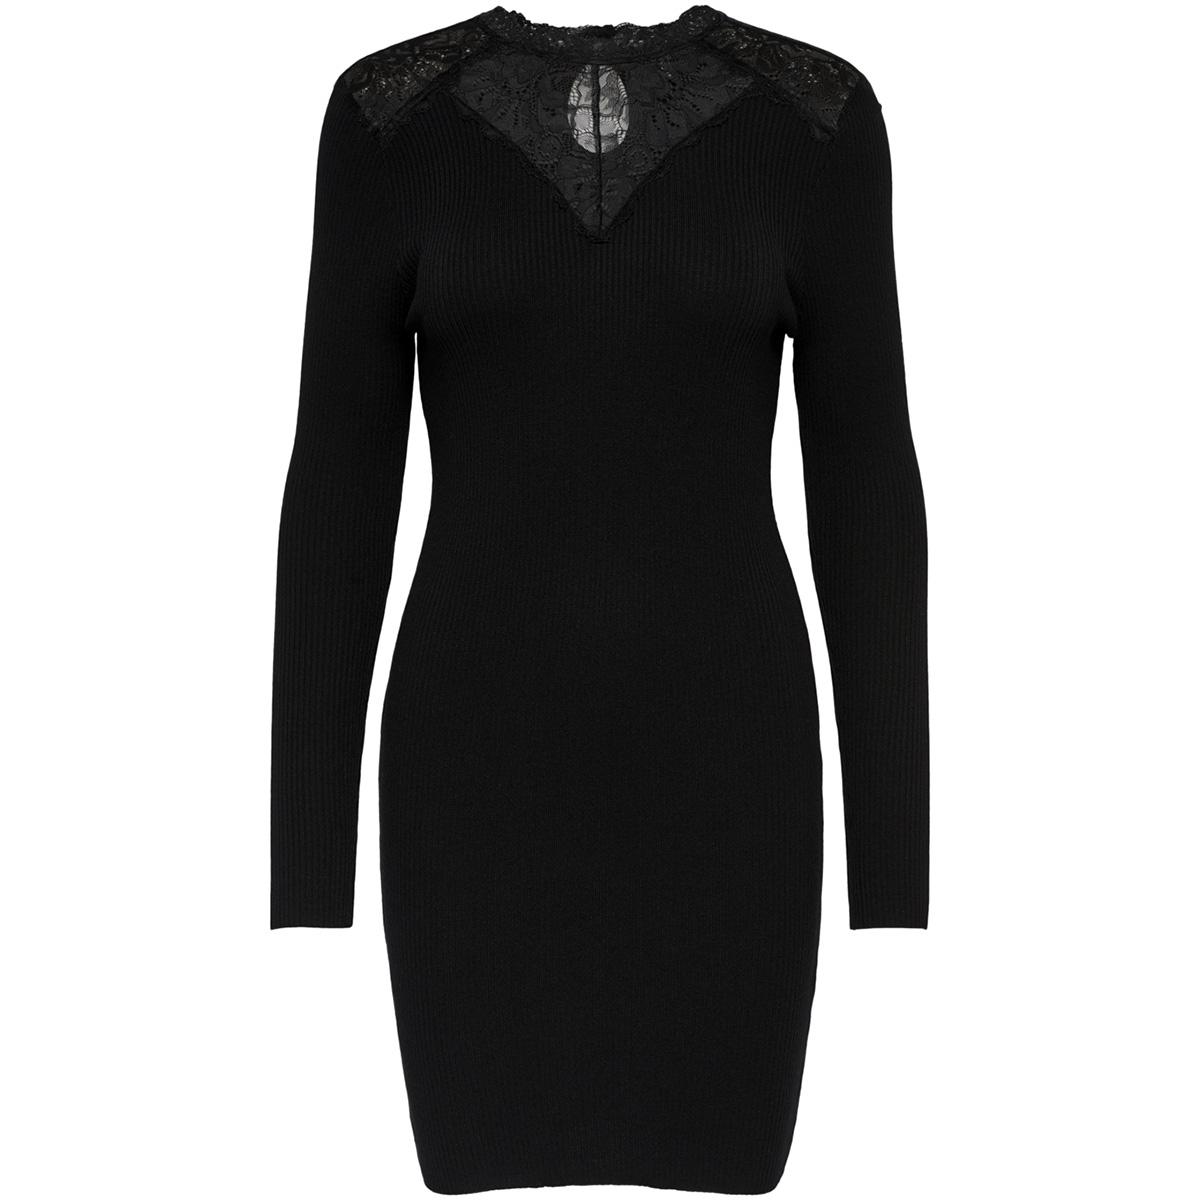 onlilaria l/s dress knt 15165567 only jurk black